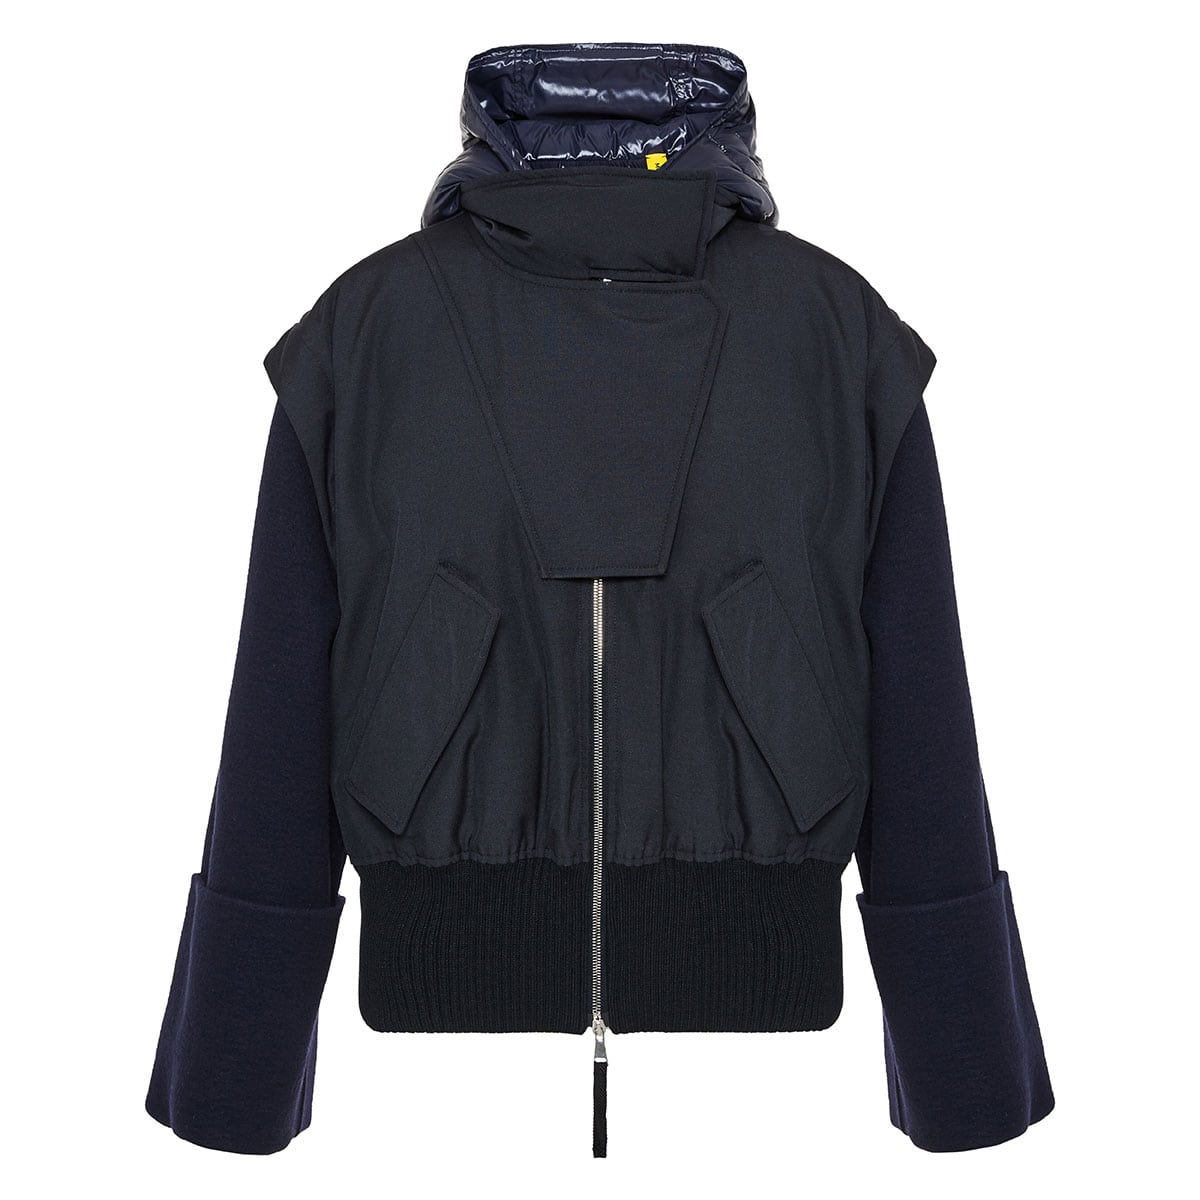 2 MONCLER 1952 + VALEXTRA Elorn oversized jacket